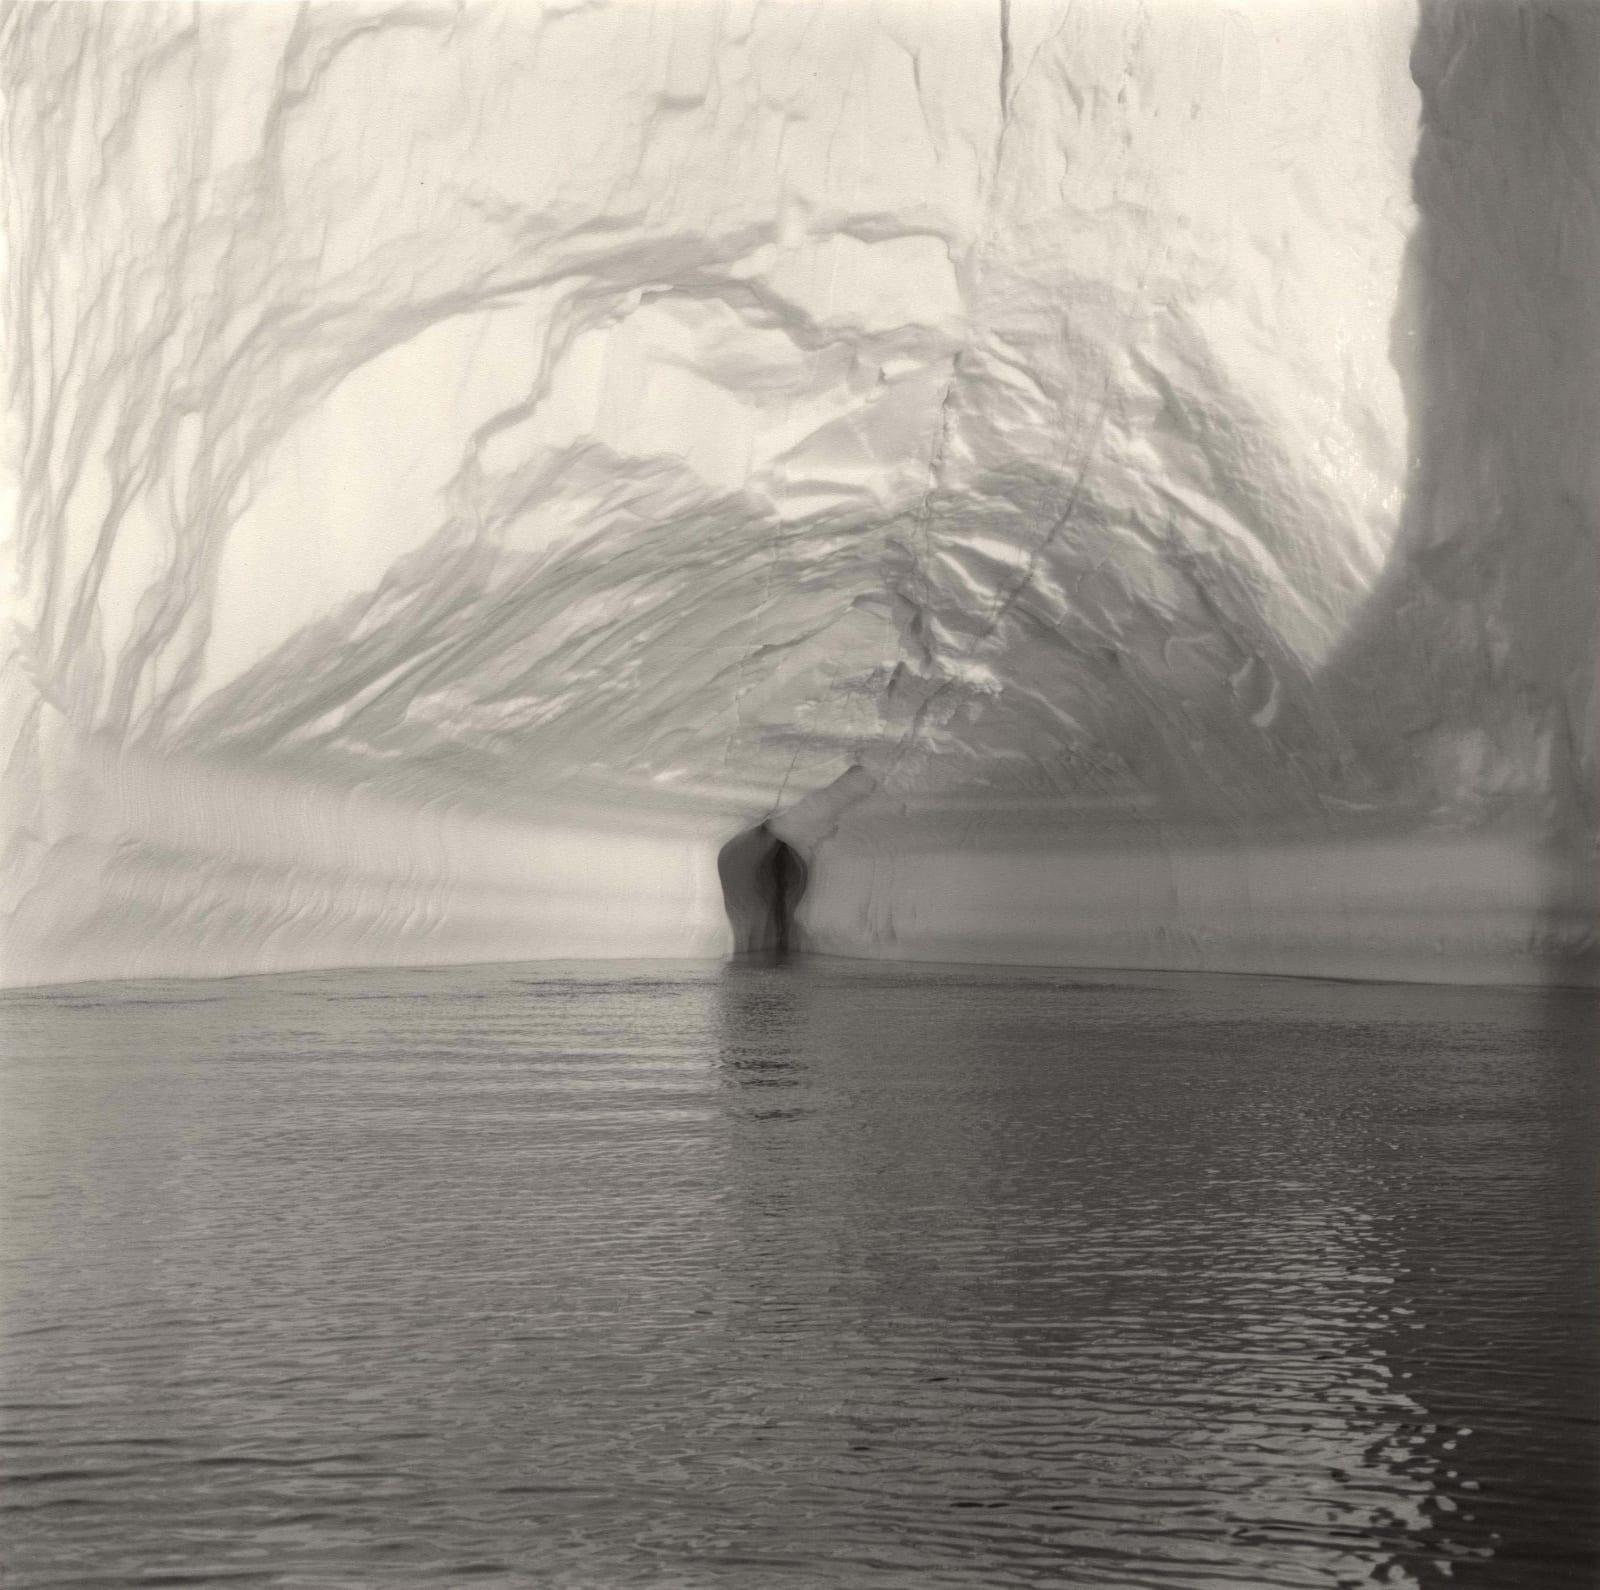 Lynn Davis photograph of small hole in center of iceberg in Disko Bay, Greenland